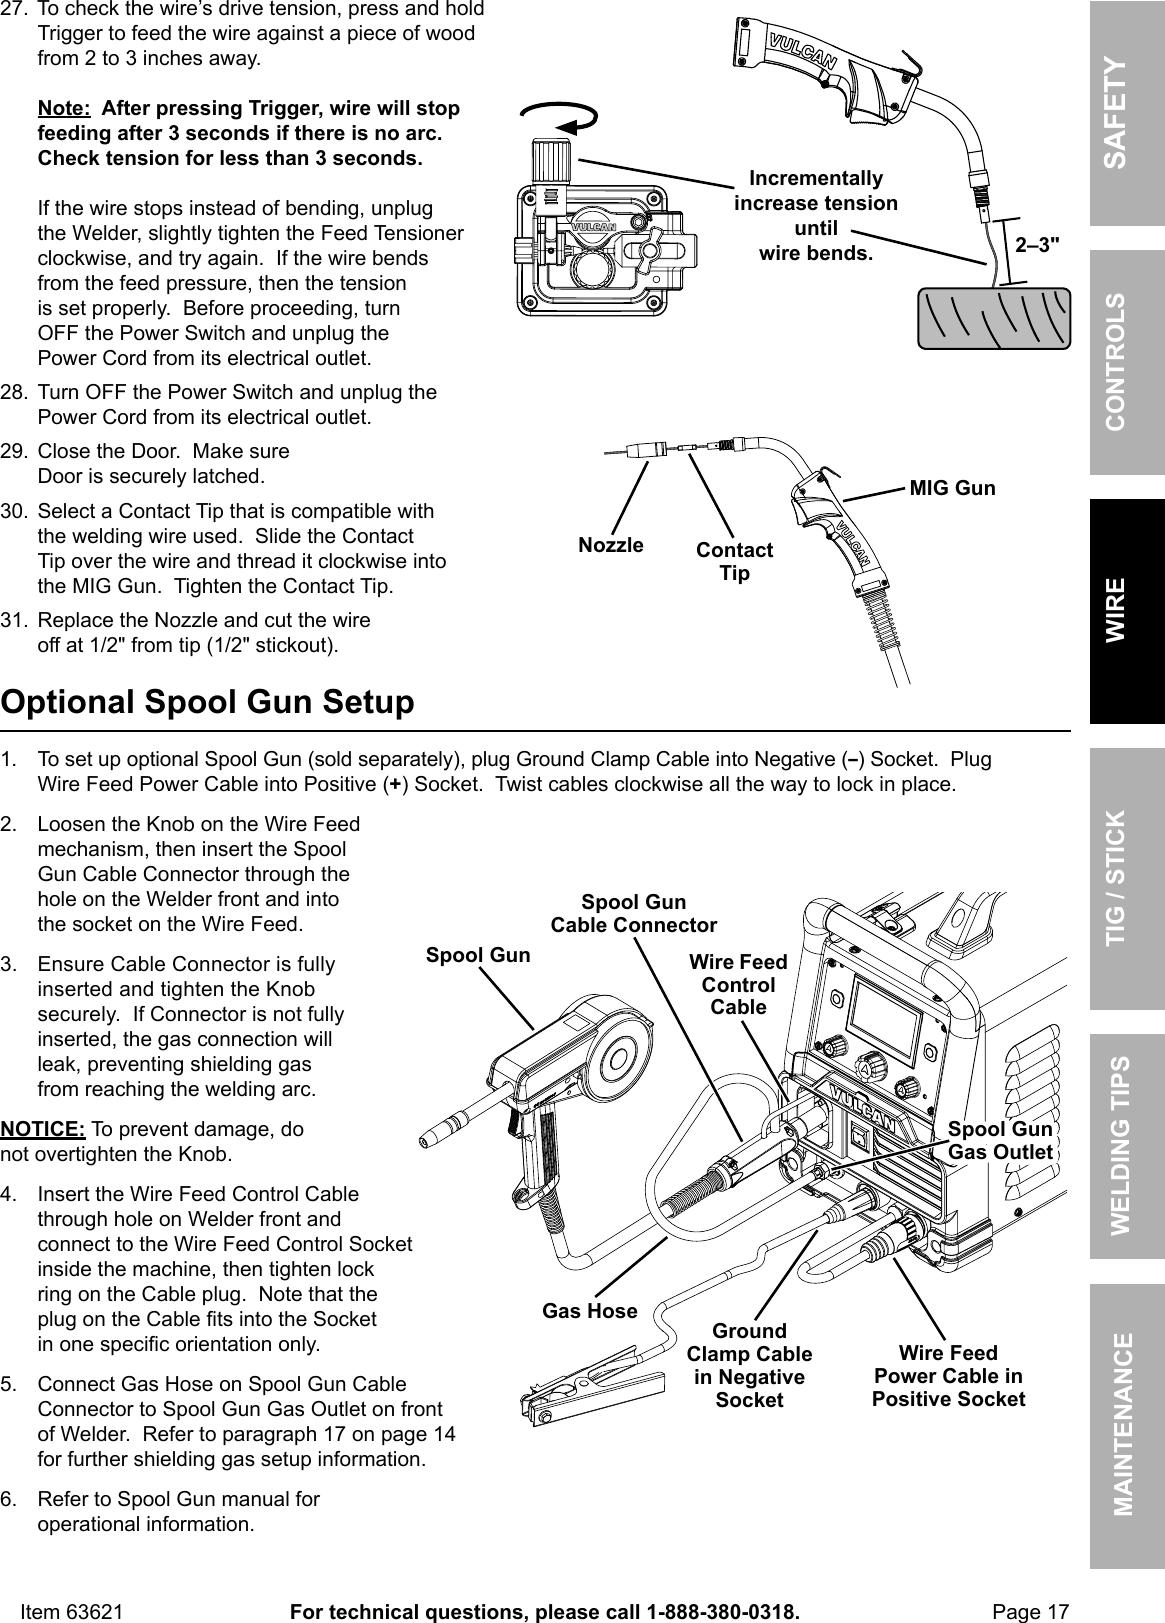 Mig Gun Diagram Wiring Library